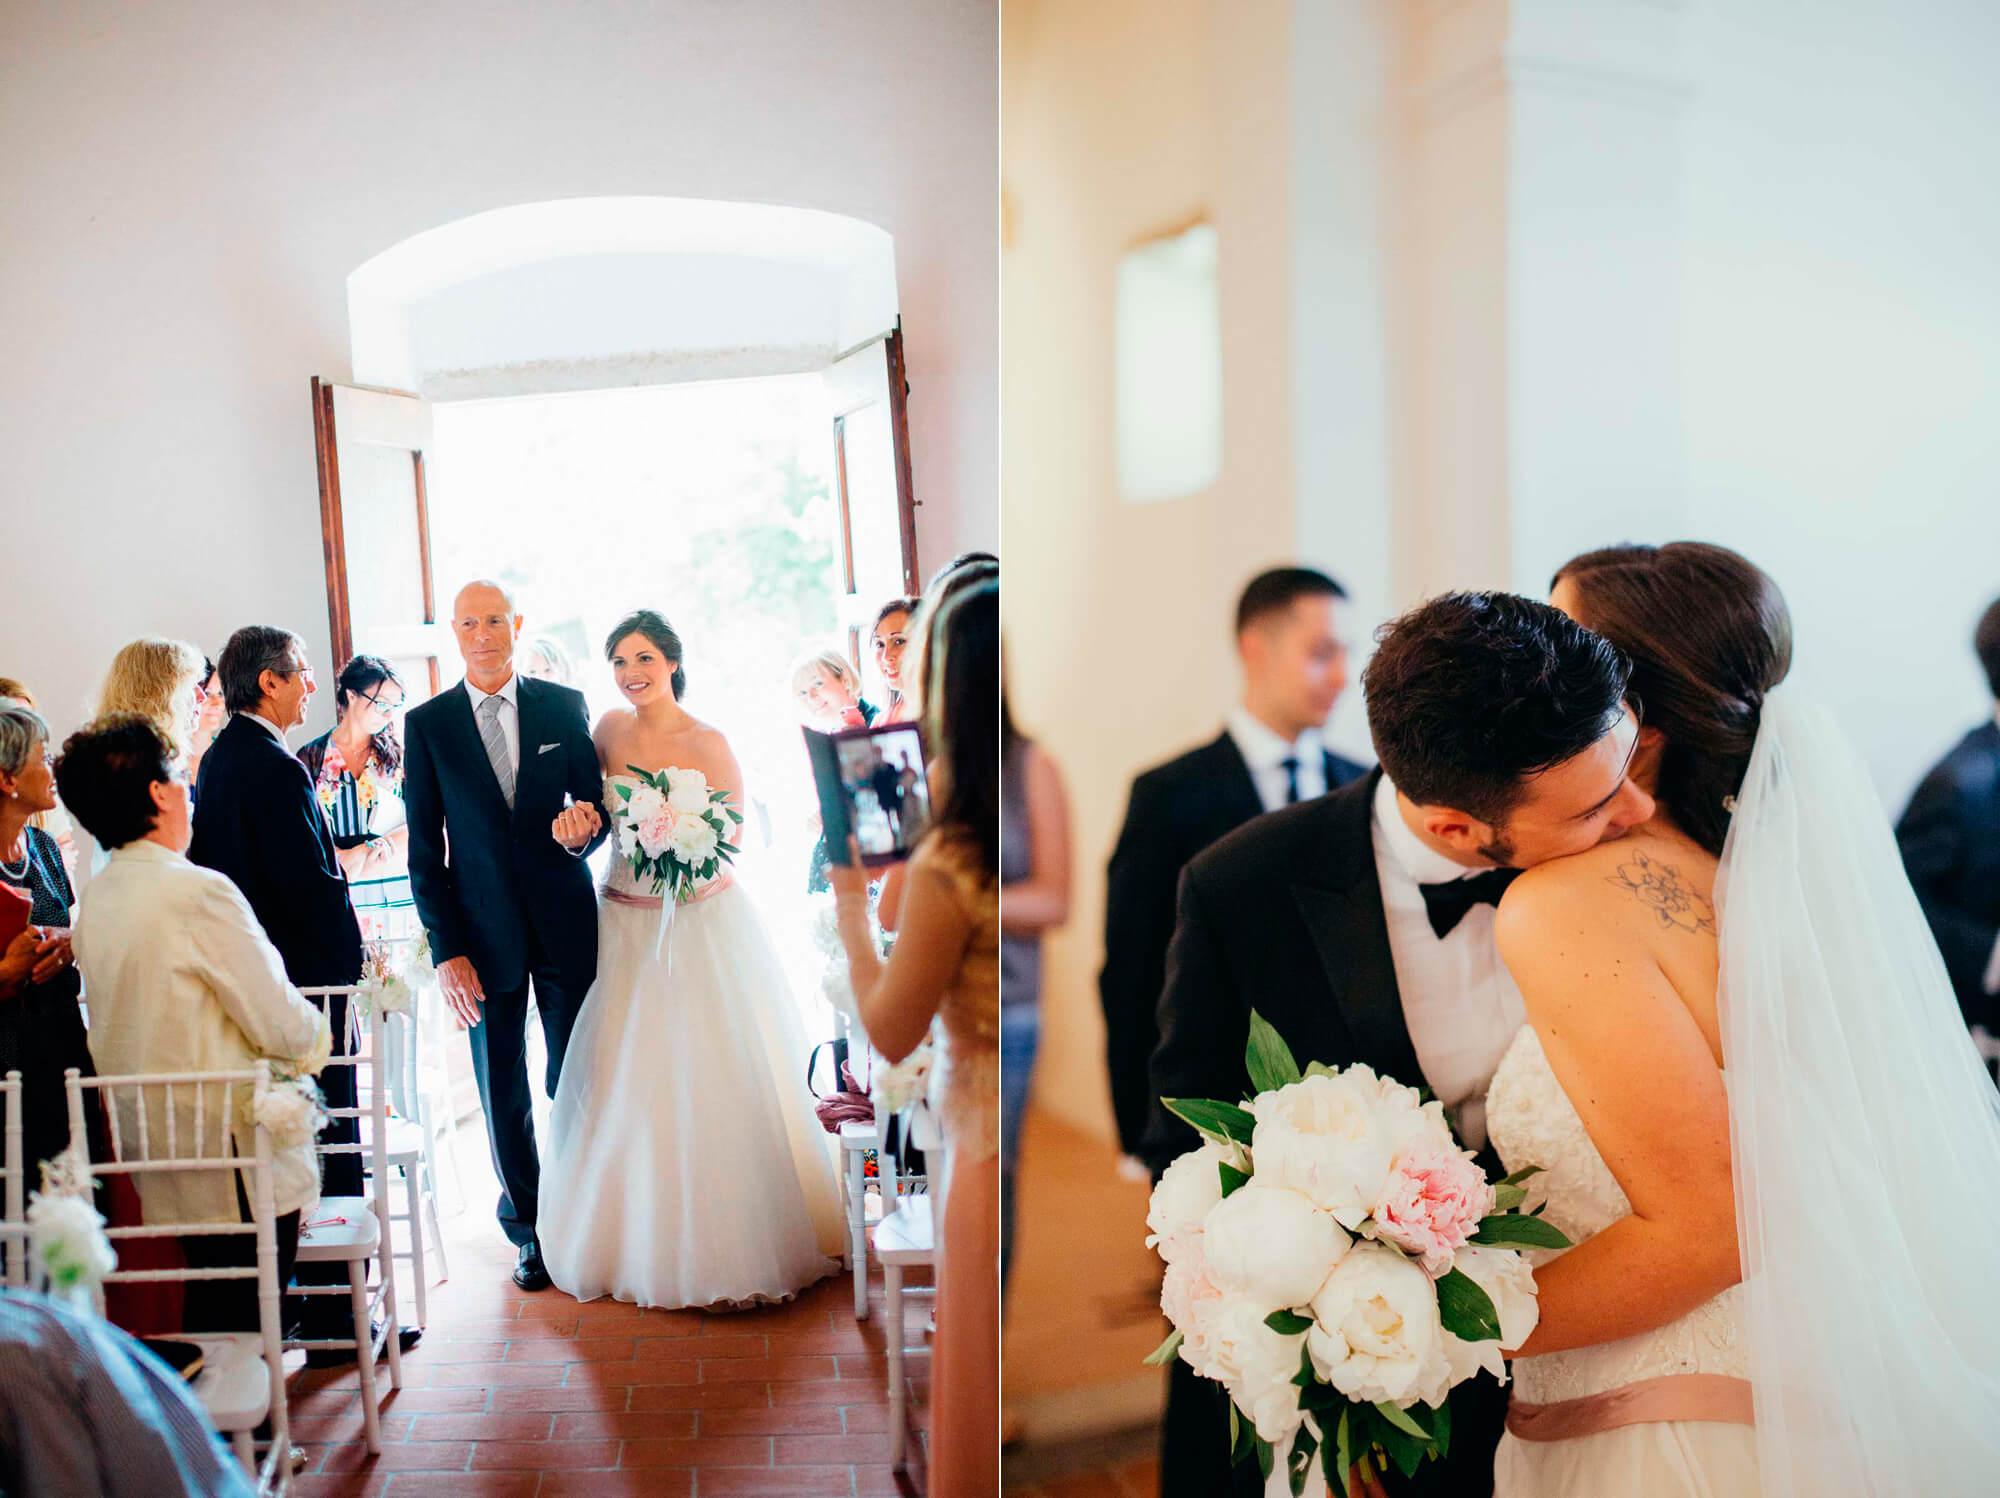 059-arezzo-wedding-photographer.jpg